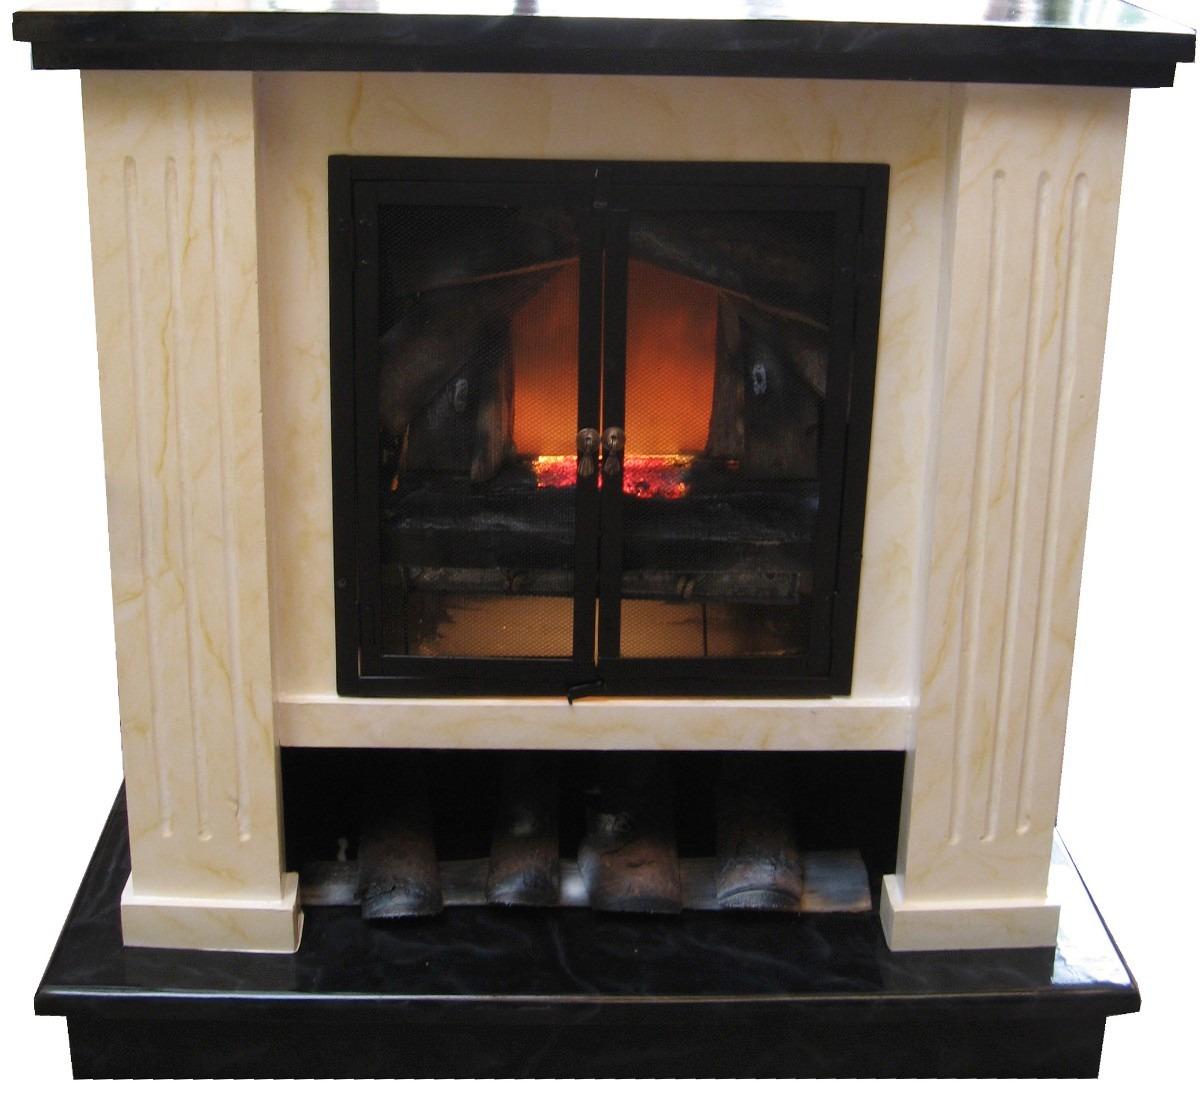 Chimenea fogata para chimenea el ctrica con calefacci n en mercado libre - Mueble para chimenea electrica ...